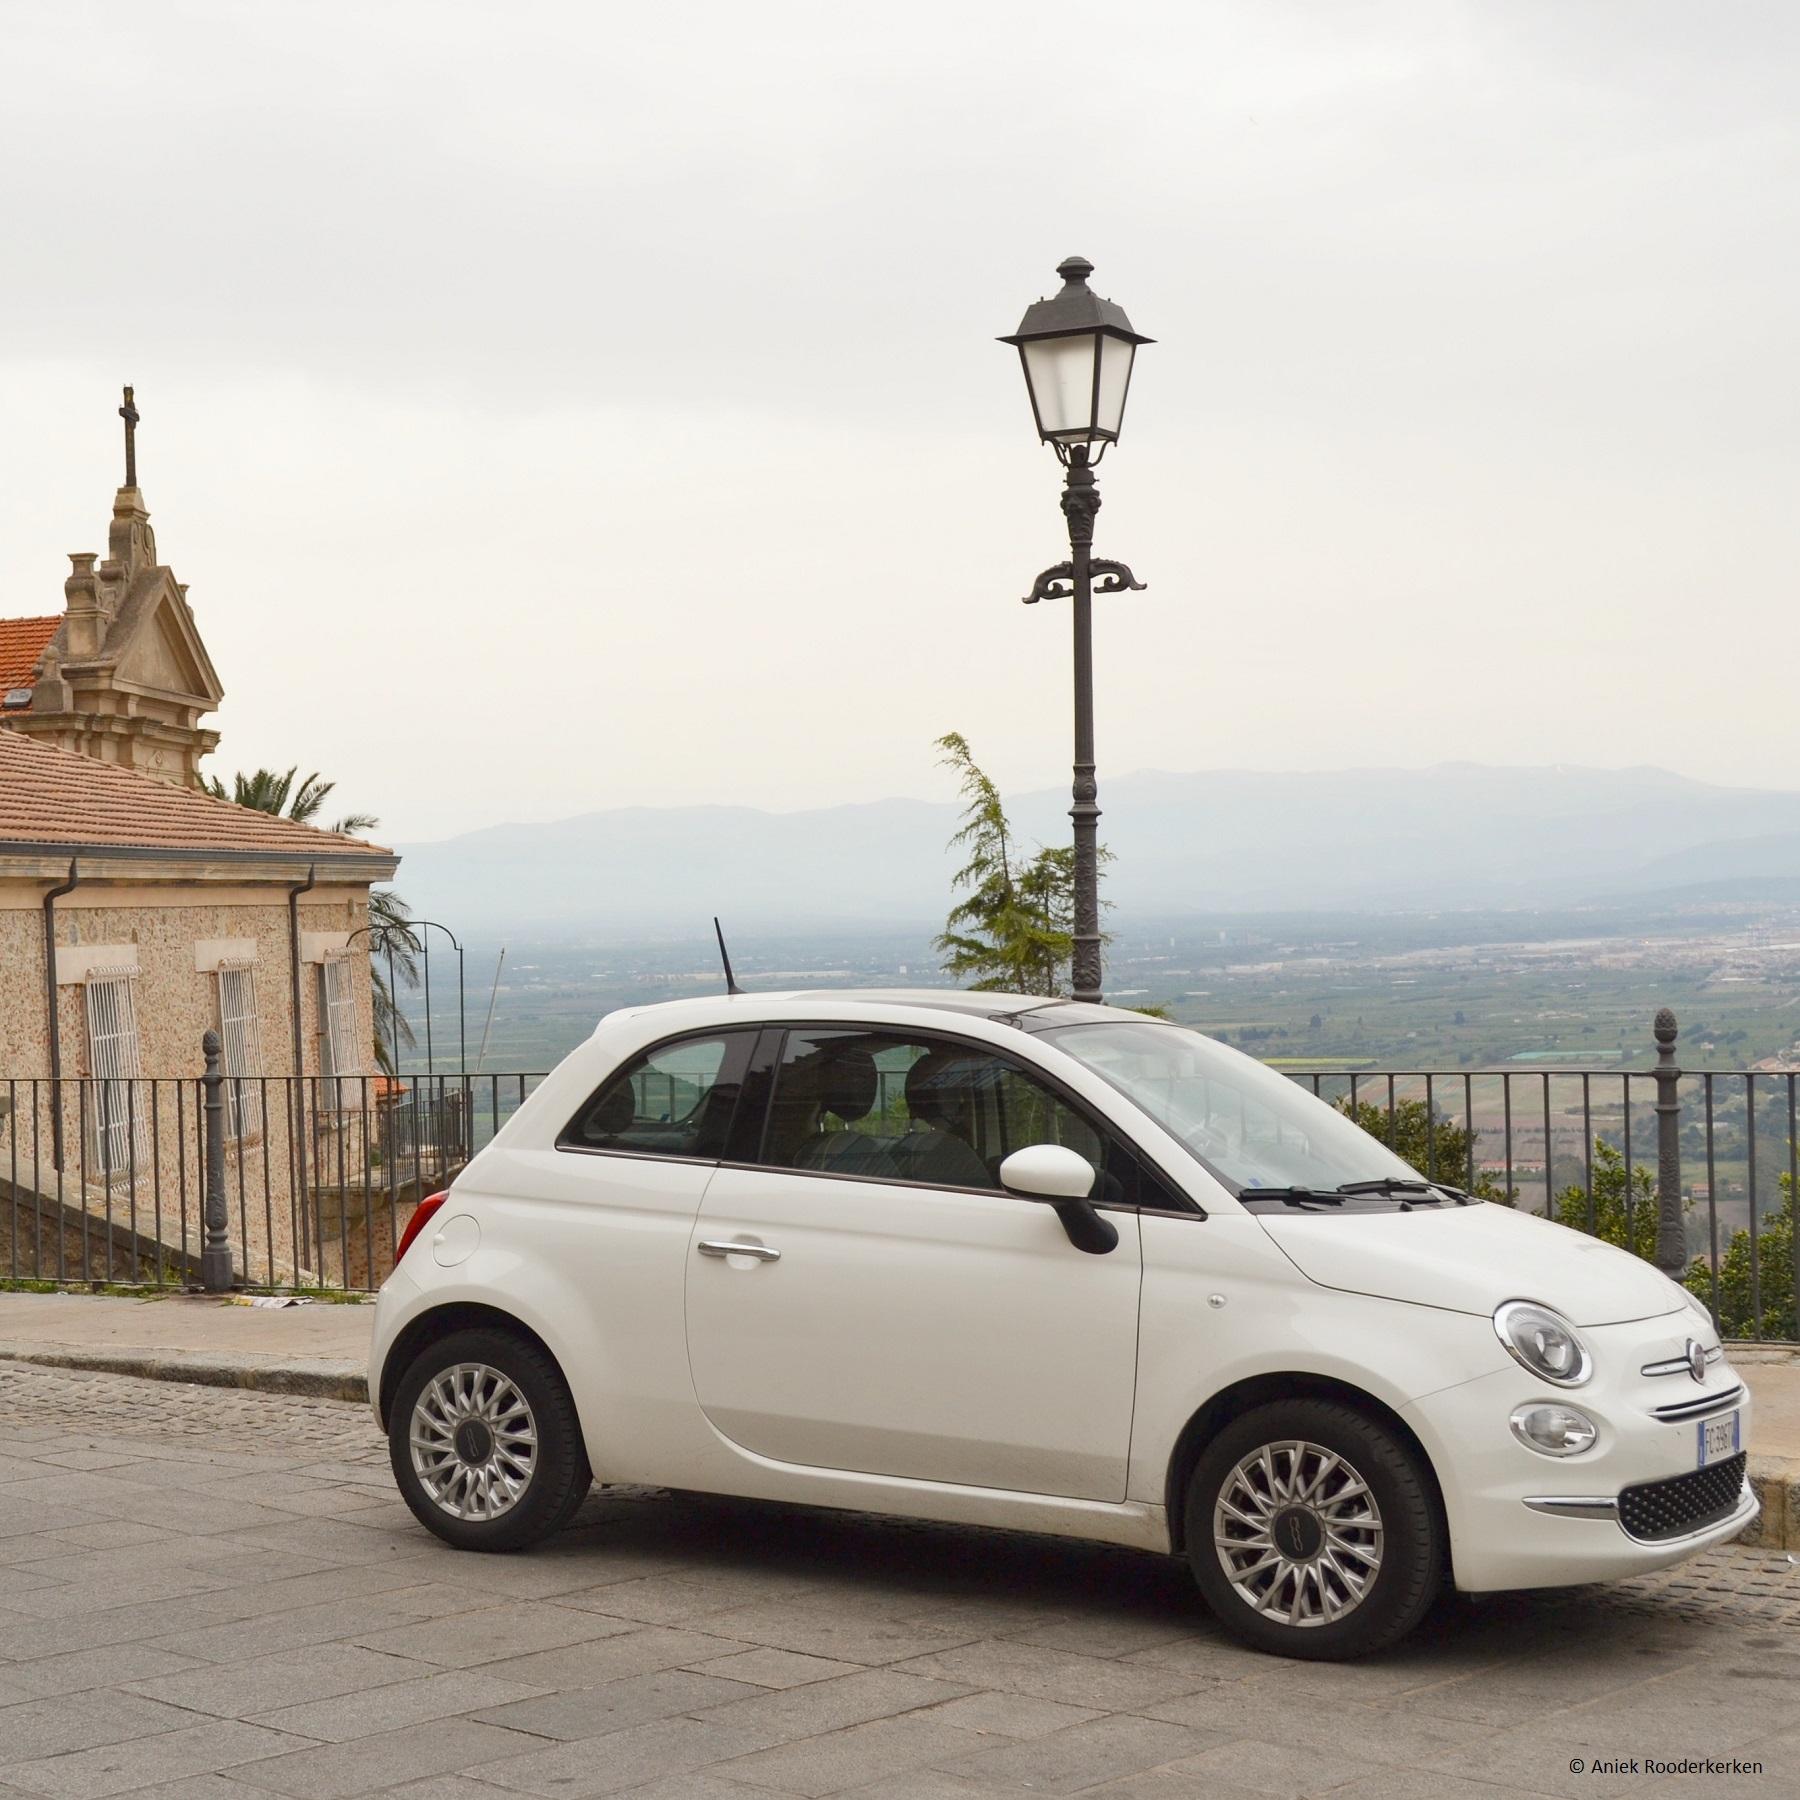 Onze Fiat 500 huurauto in Nicotera